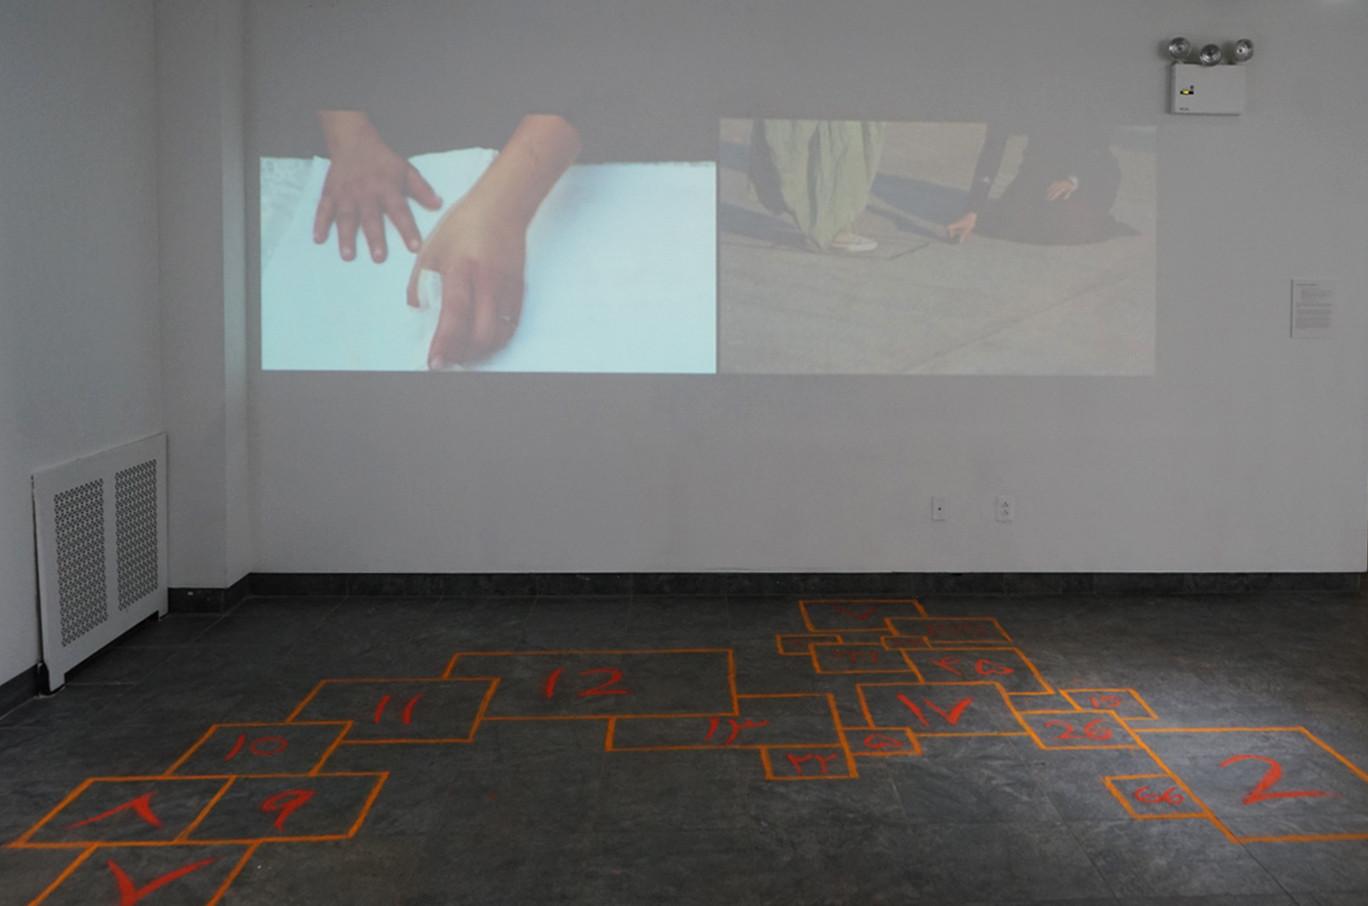 Bepar (Hop) & Hopscotch Floor Installation